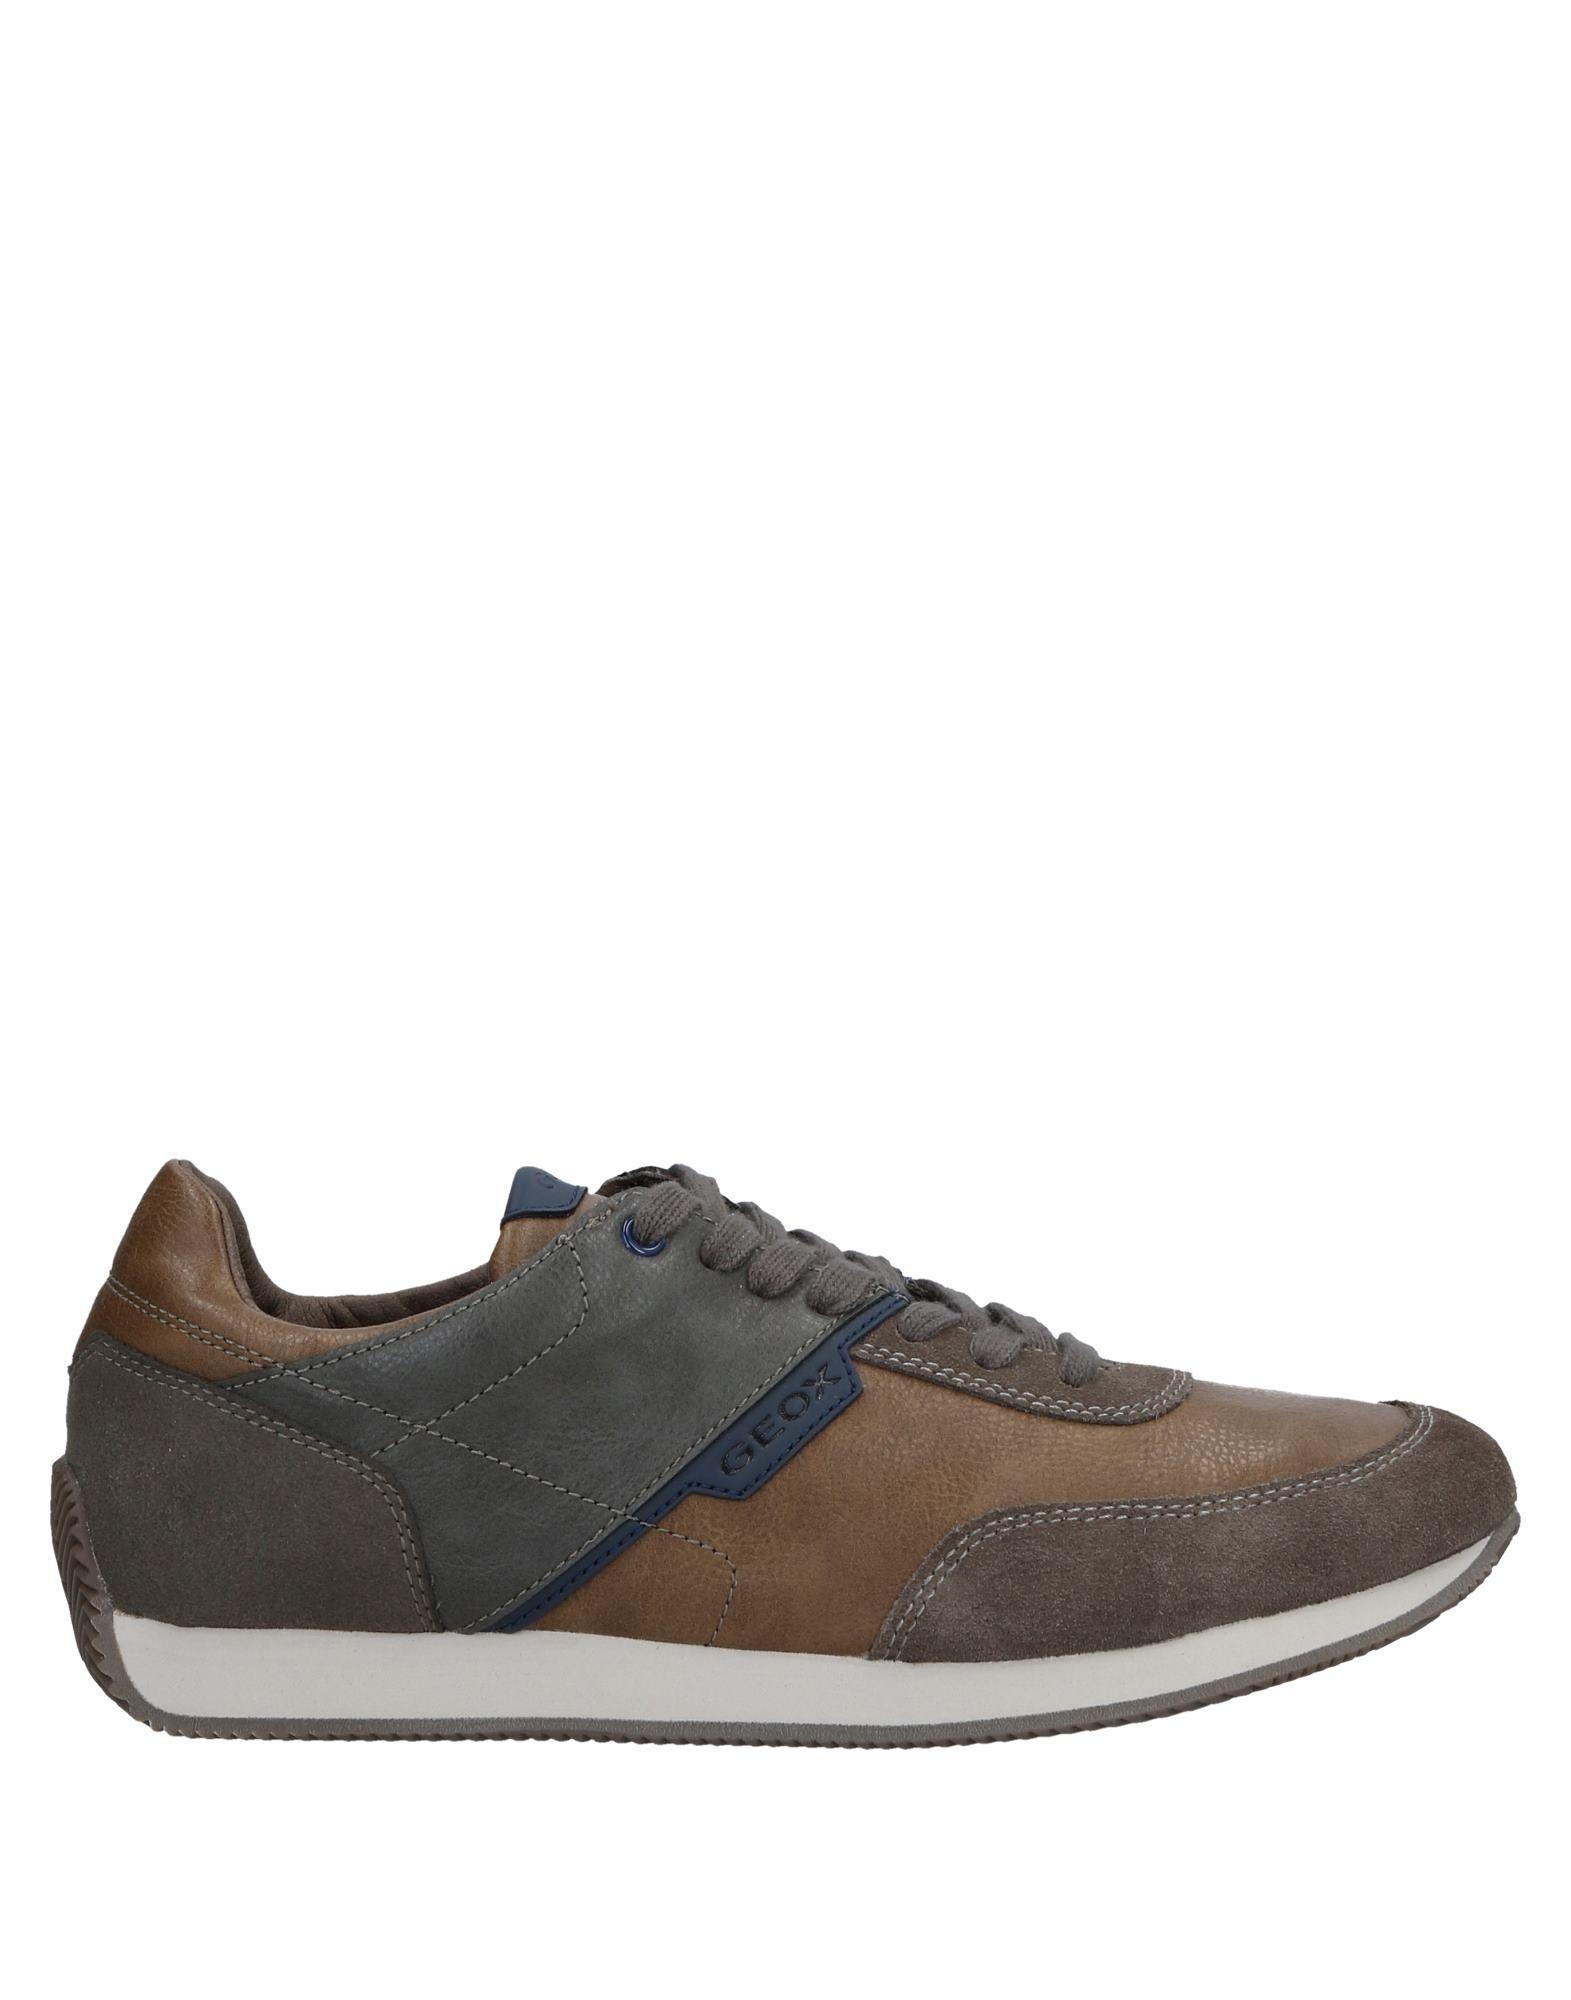 Sneakers Geox Homme - Sneakers Geox  Plomb Dédouanement saisonnier